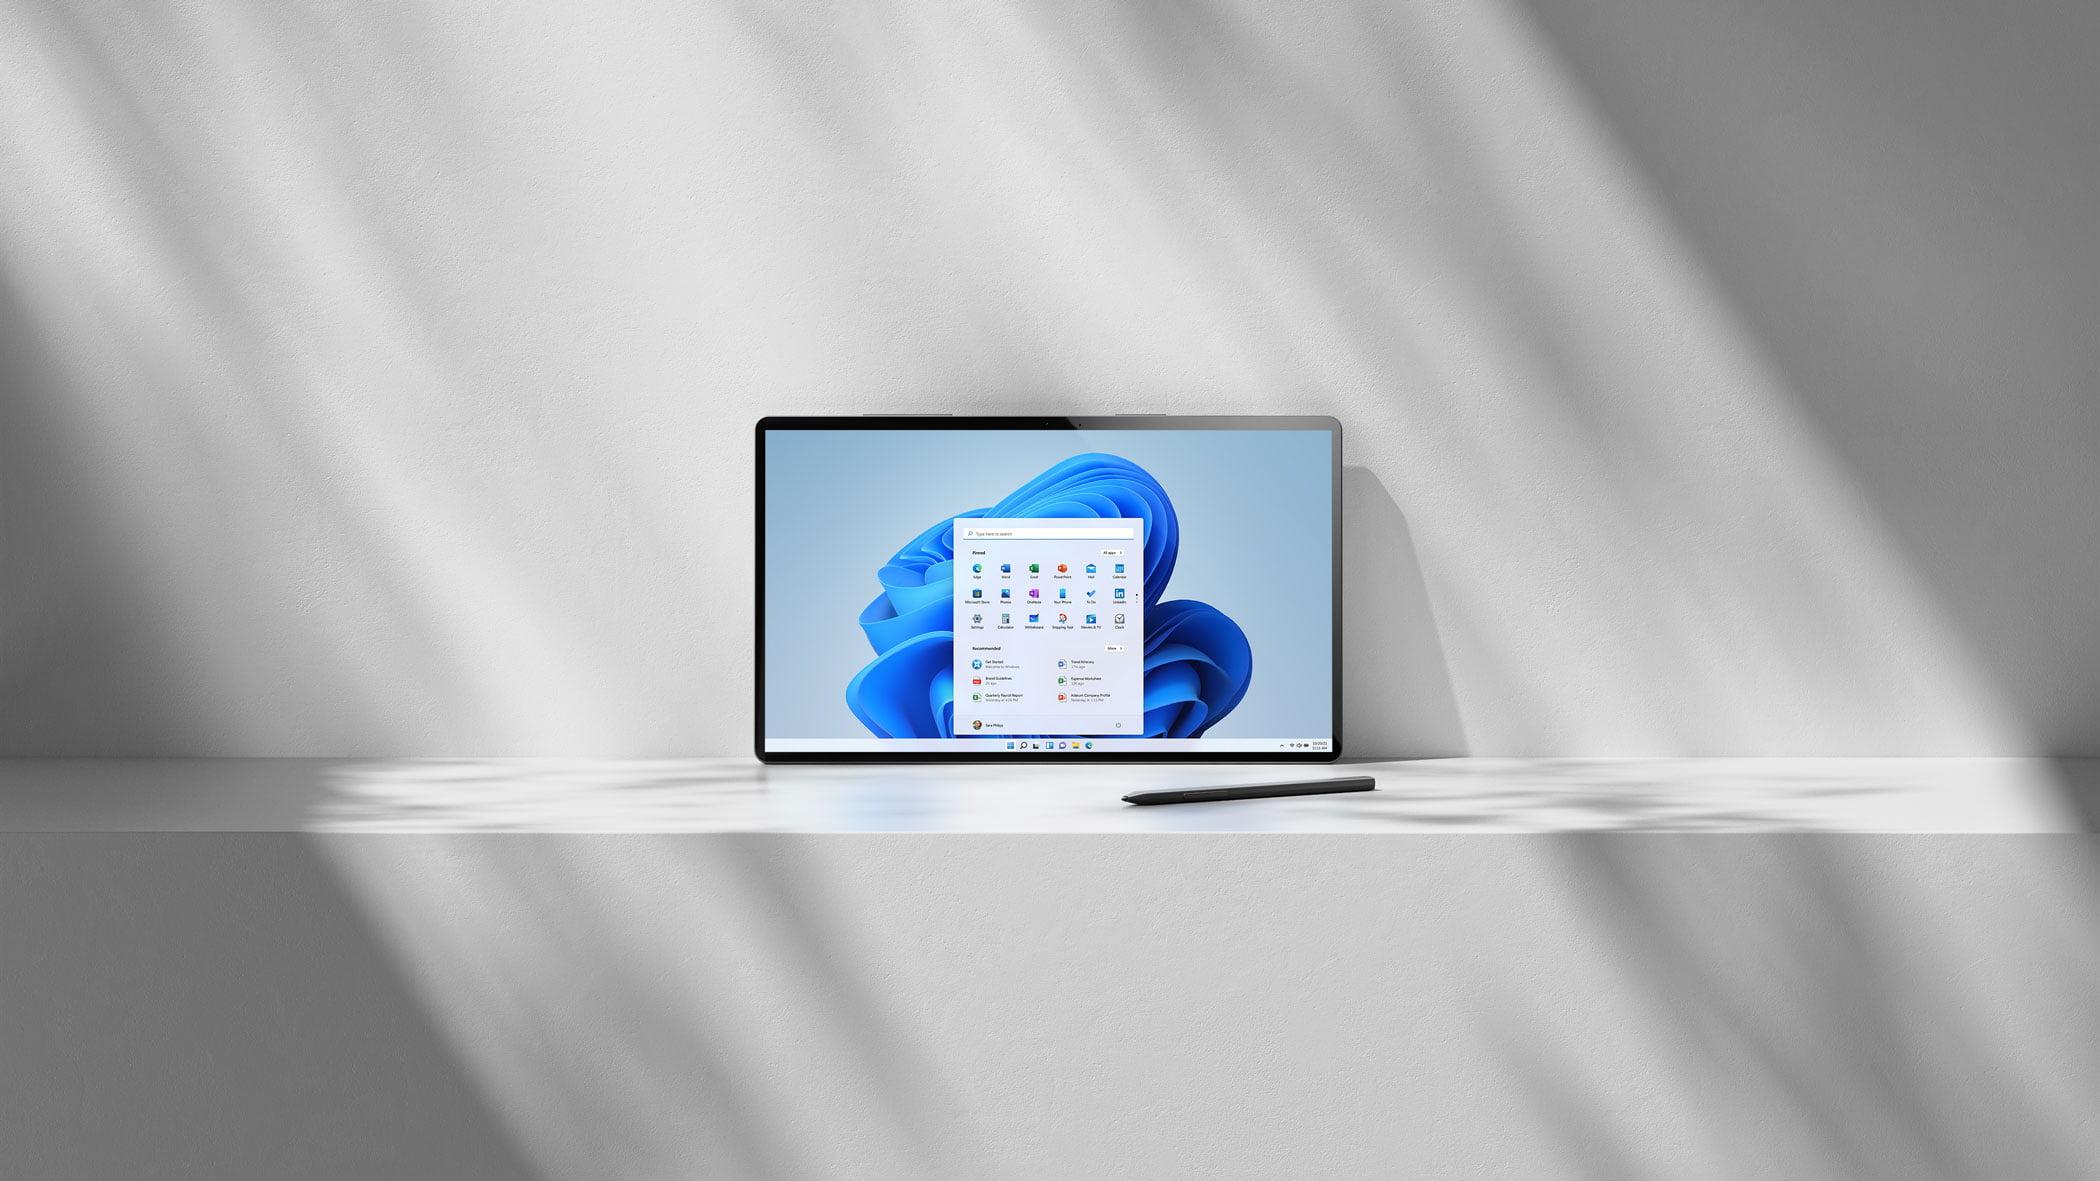 Windows 11 imagen promocional